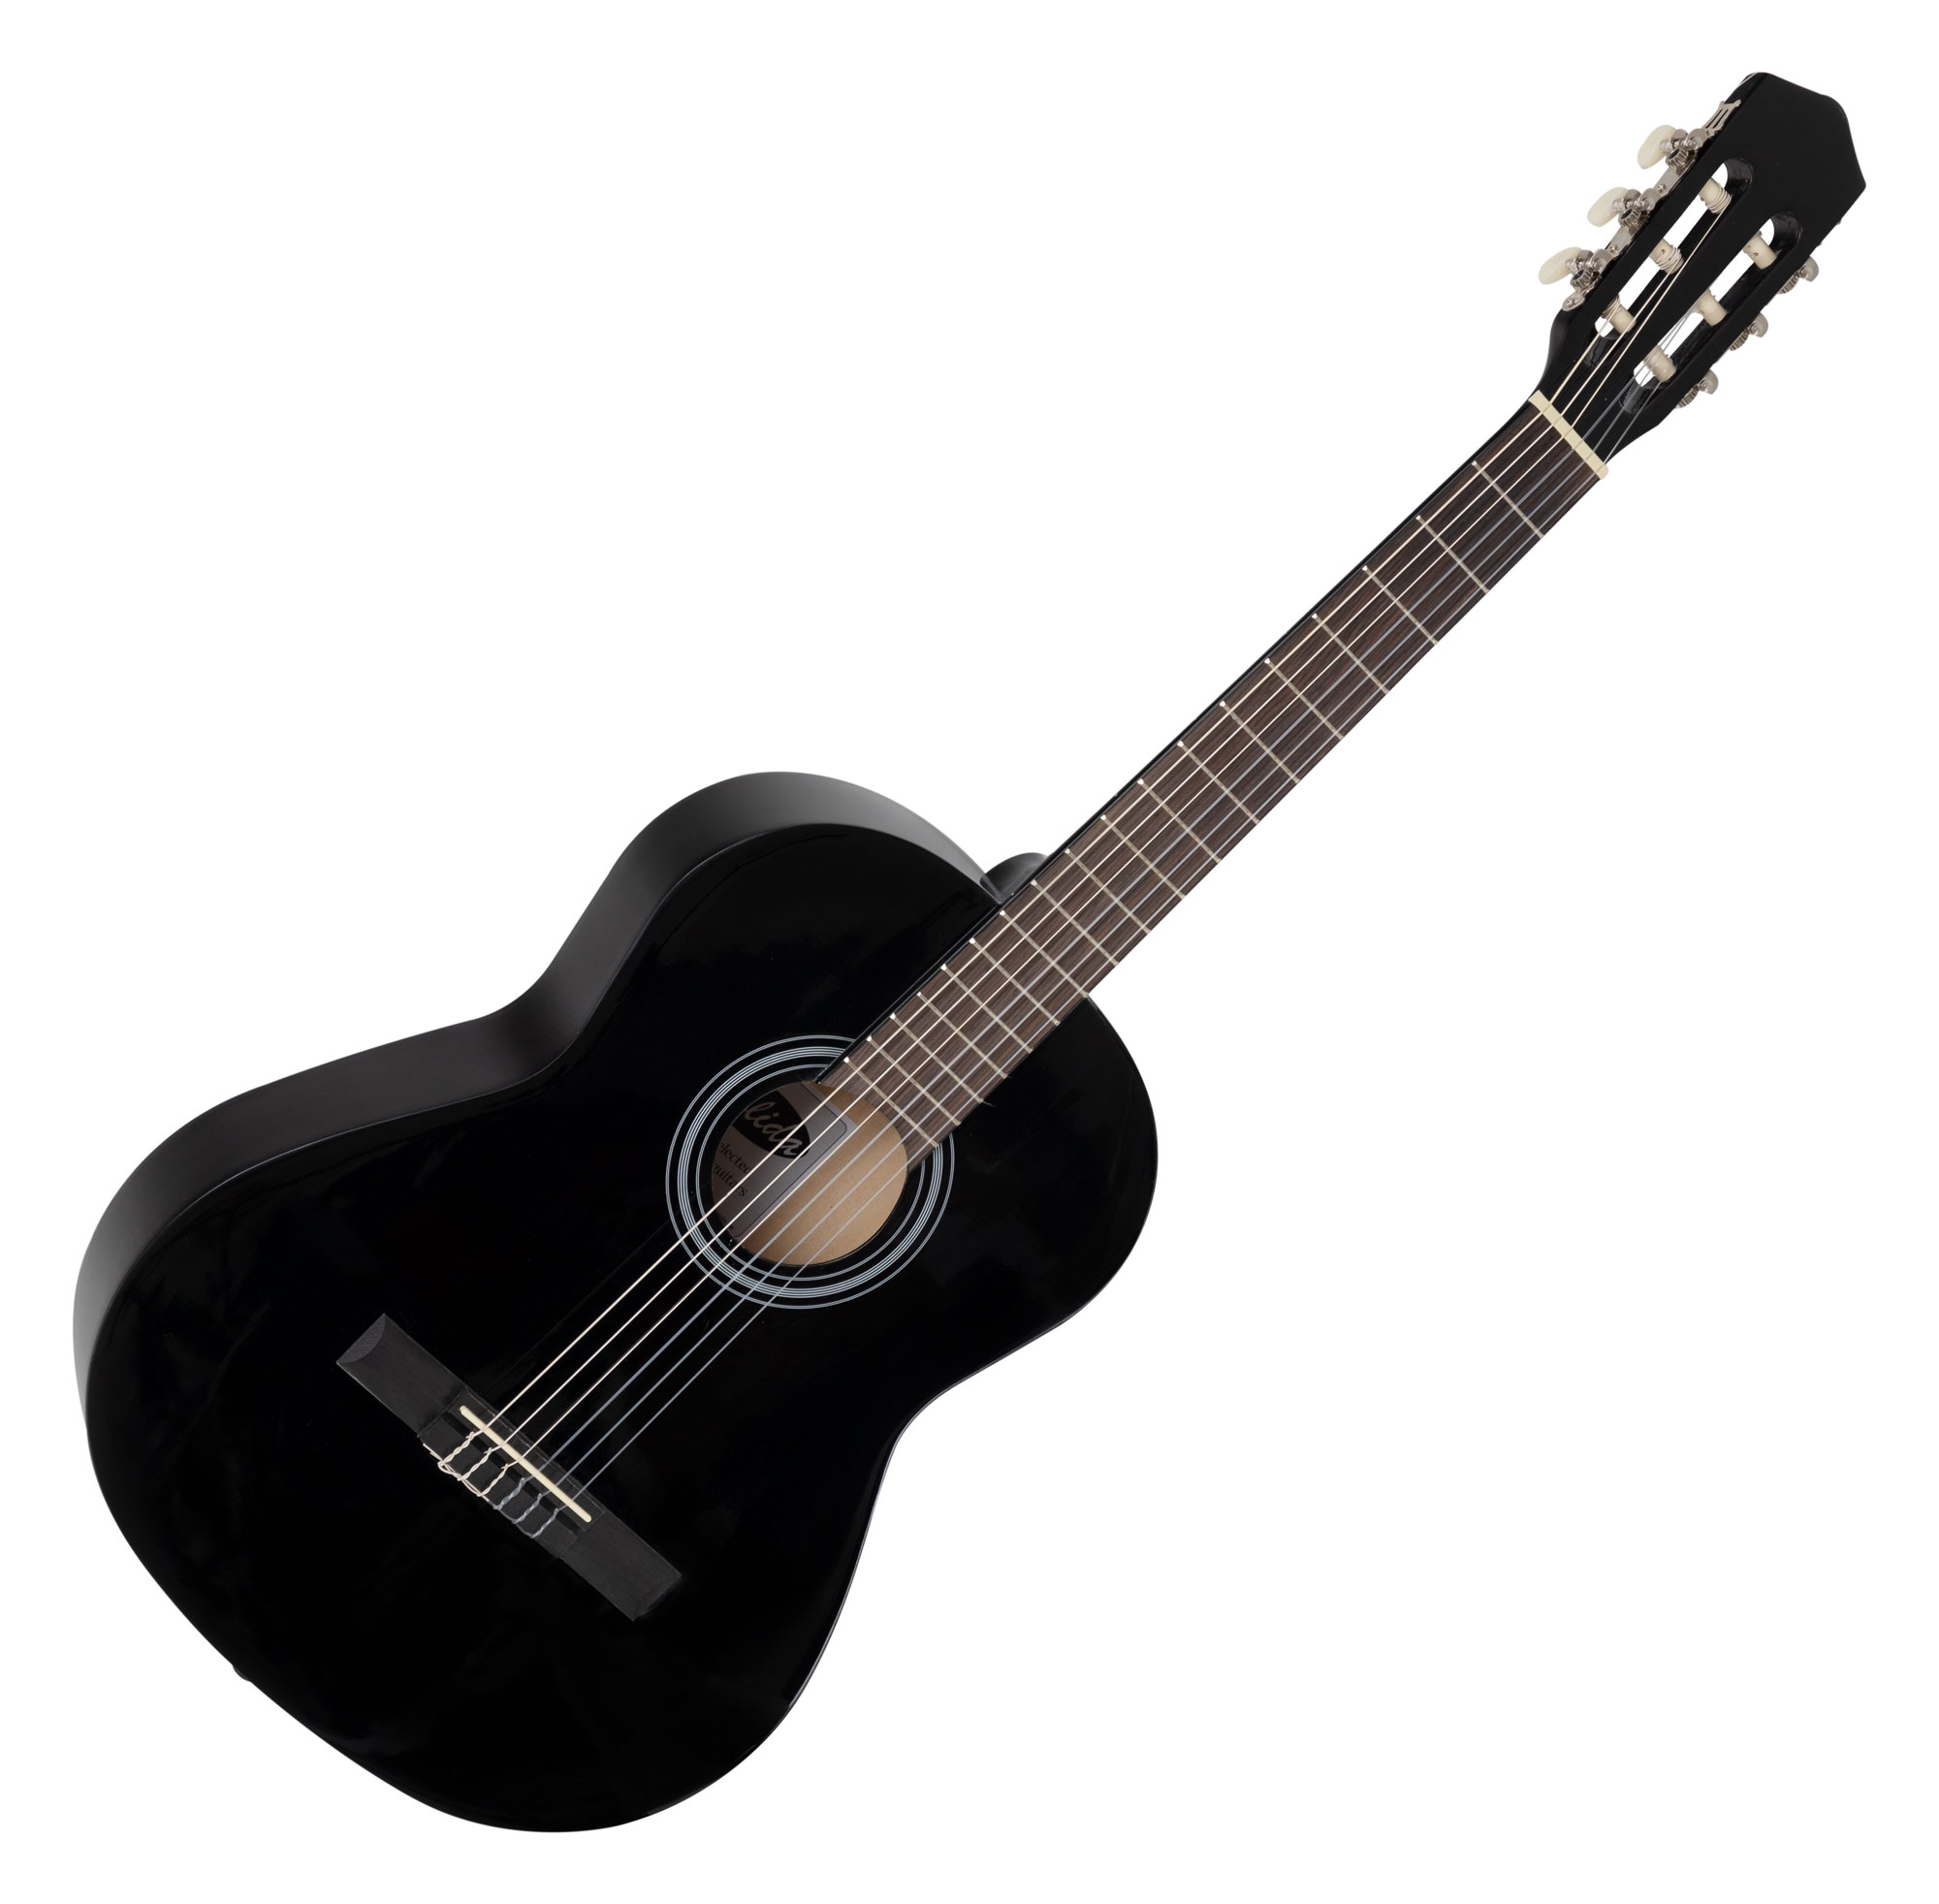 calida benita concert guitar set 7 8 black with accessories. Black Bedroom Furniture Sets. Home Design Ideas